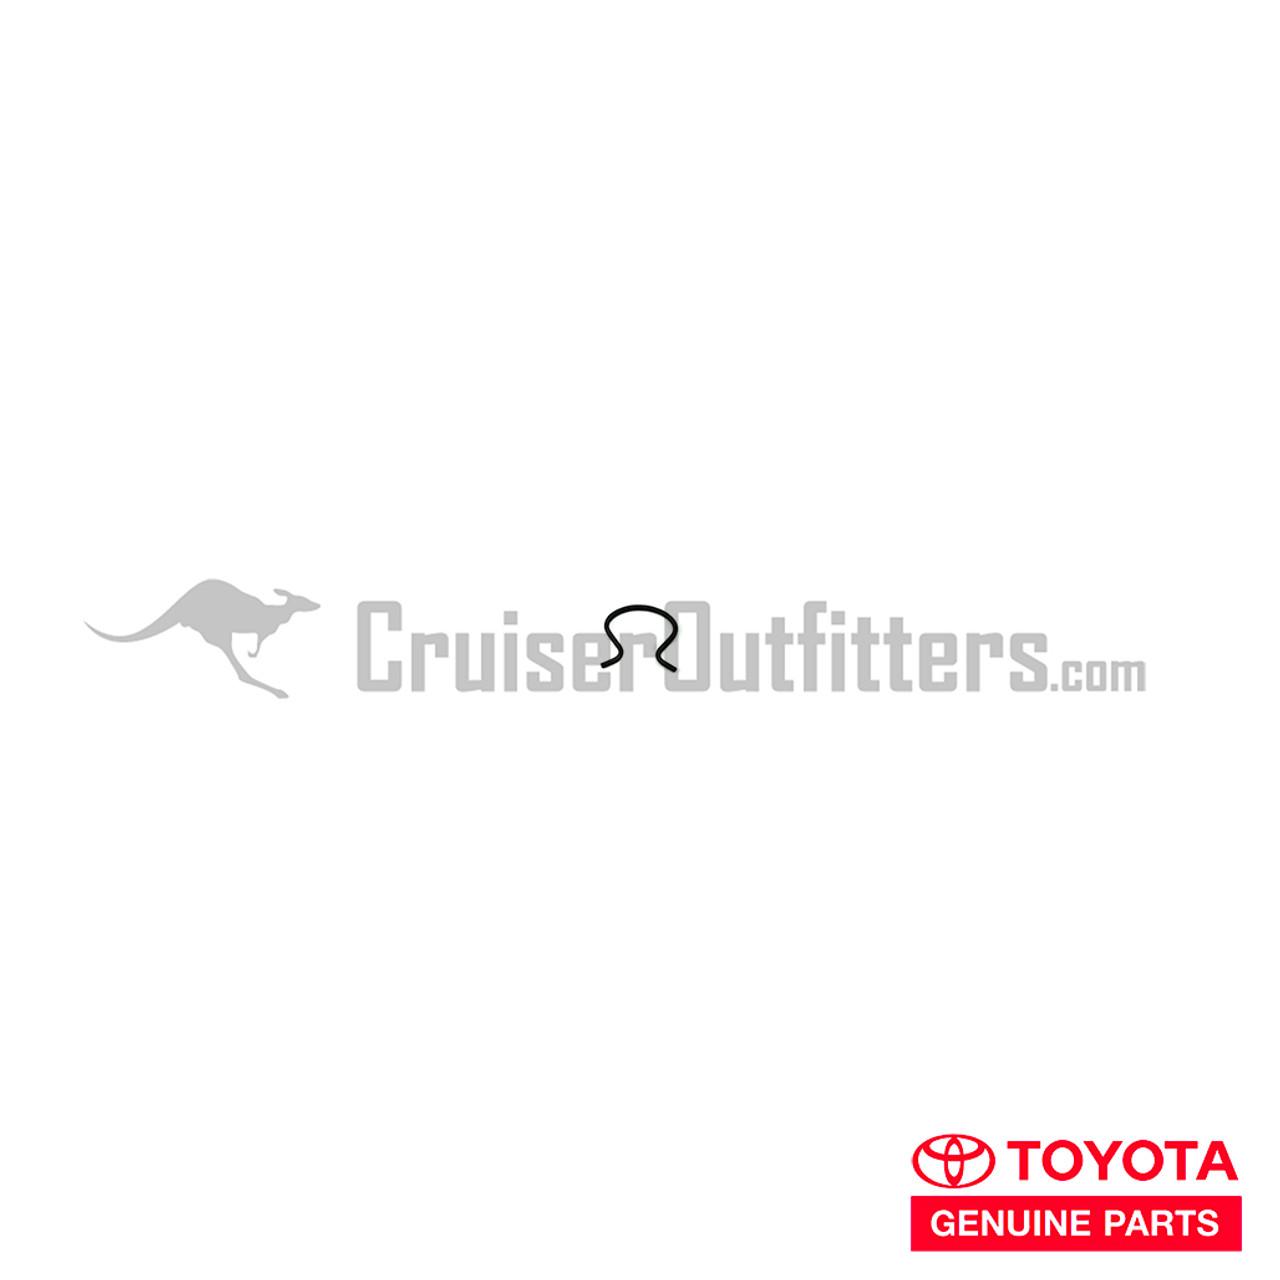 Window Crank Retainer Clip - OEM Toyota - Fits (INT01274)